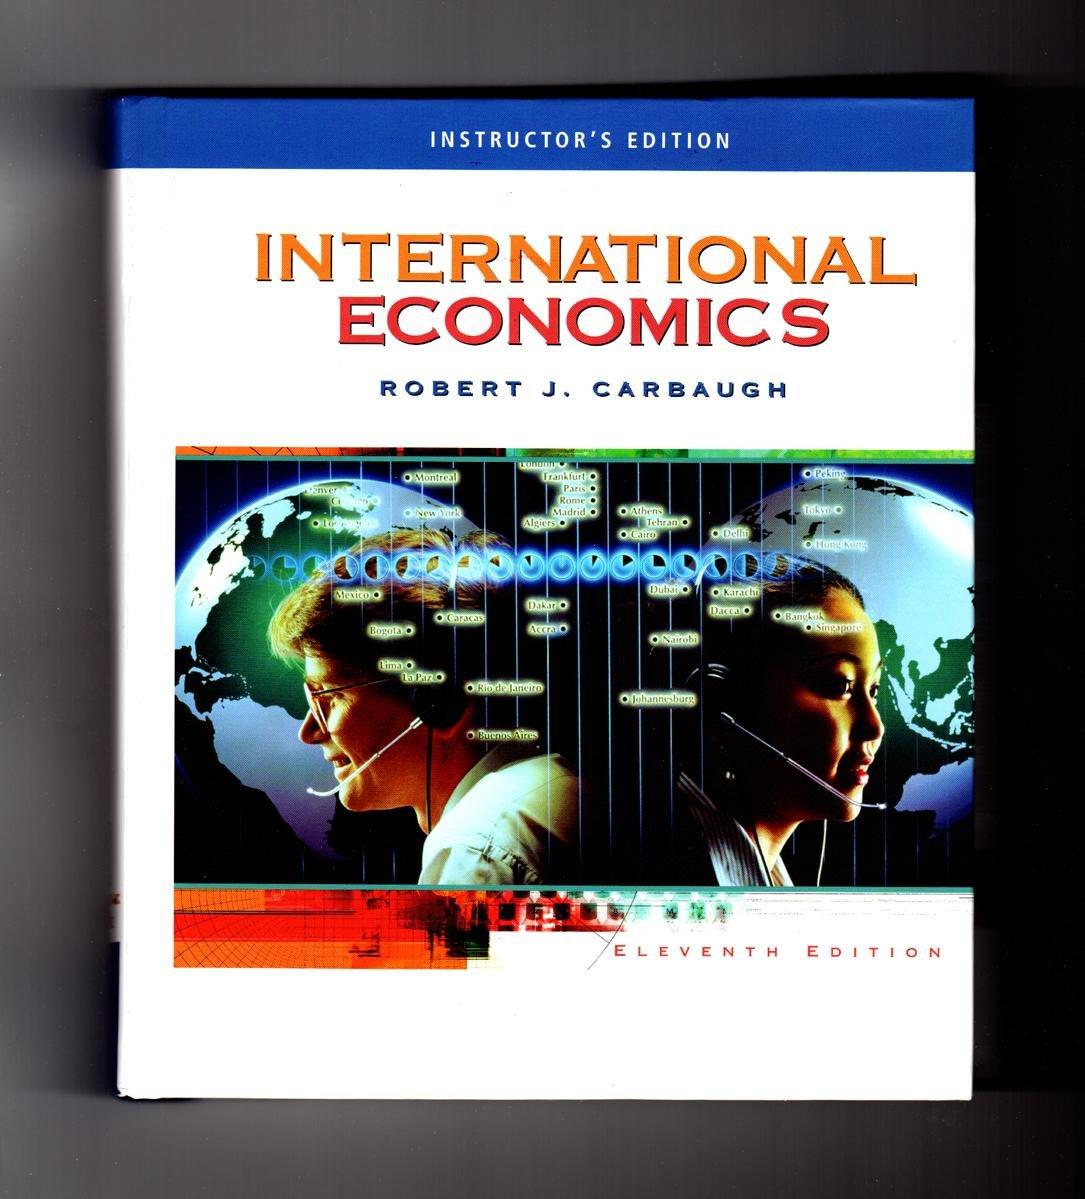 International economics 11th edition robert j carbaugh international economics 11th edition robert j carbaugh 9780324538410 amazon books fandeluxe Gallery